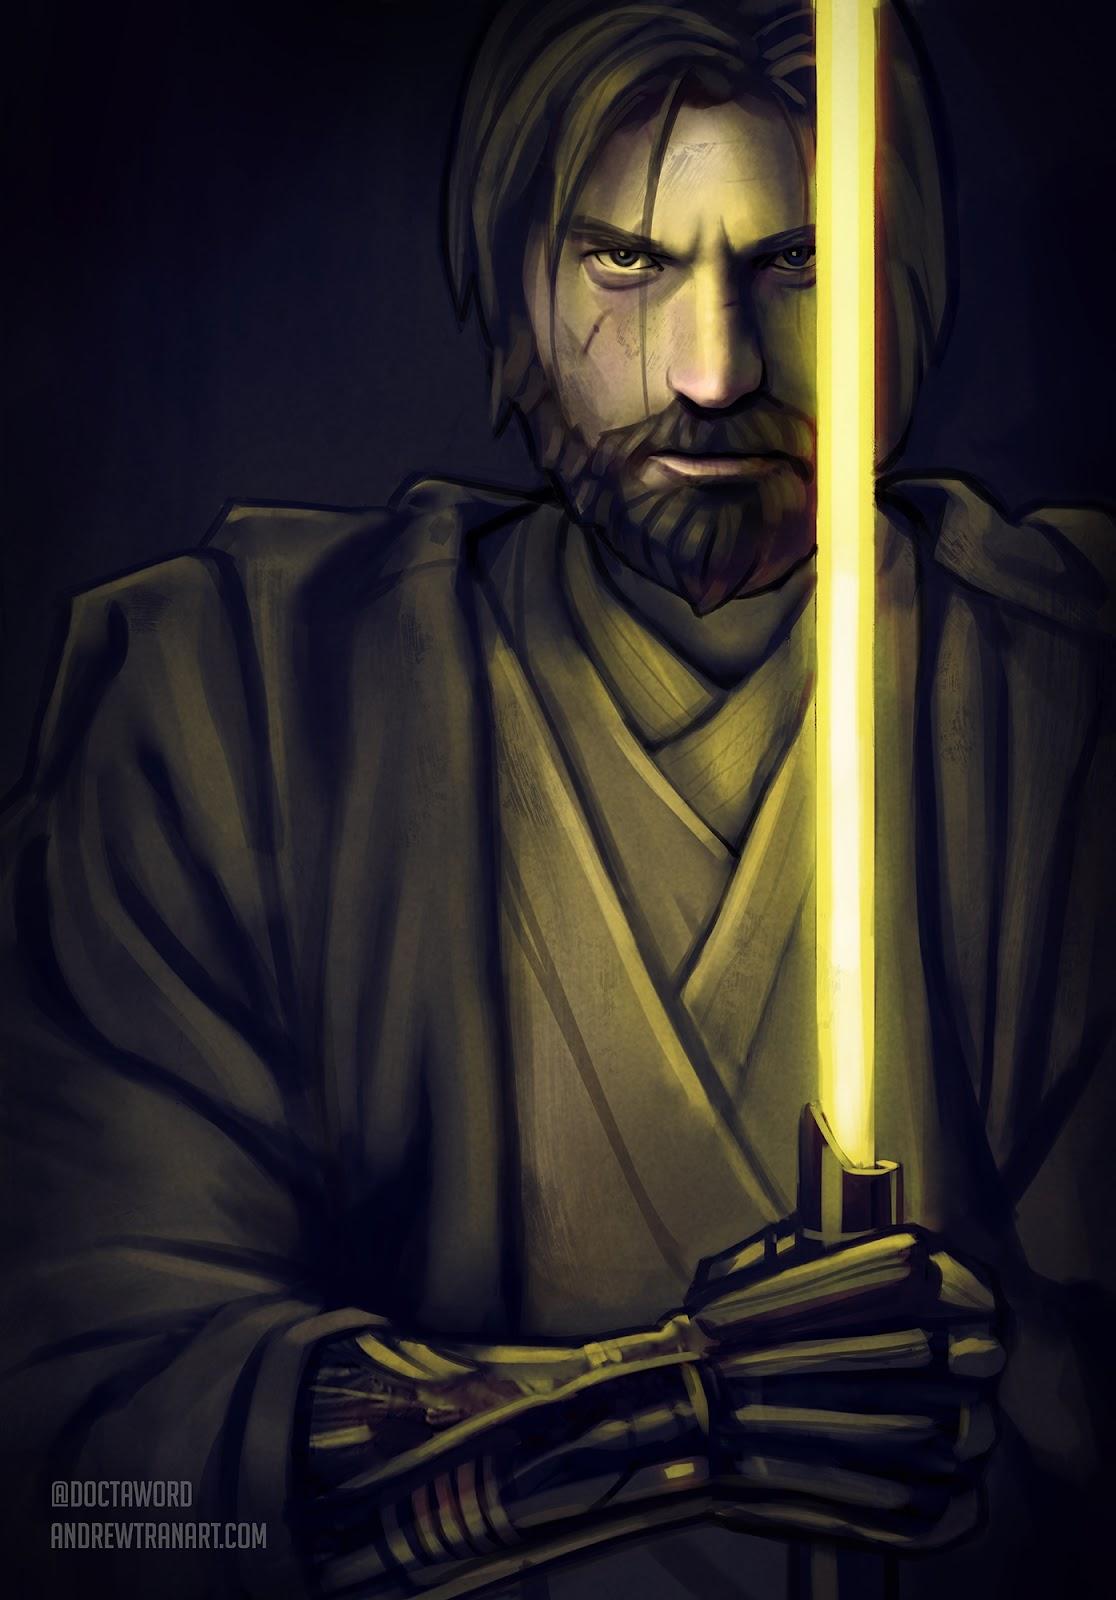 03-Jaime-Lannister-Nikolaj-Coster-Waldau-Andrew-D-Tran-Doctaword-Star-Wars-and-Game-of-Thrones-Mashup-www-designstack-co